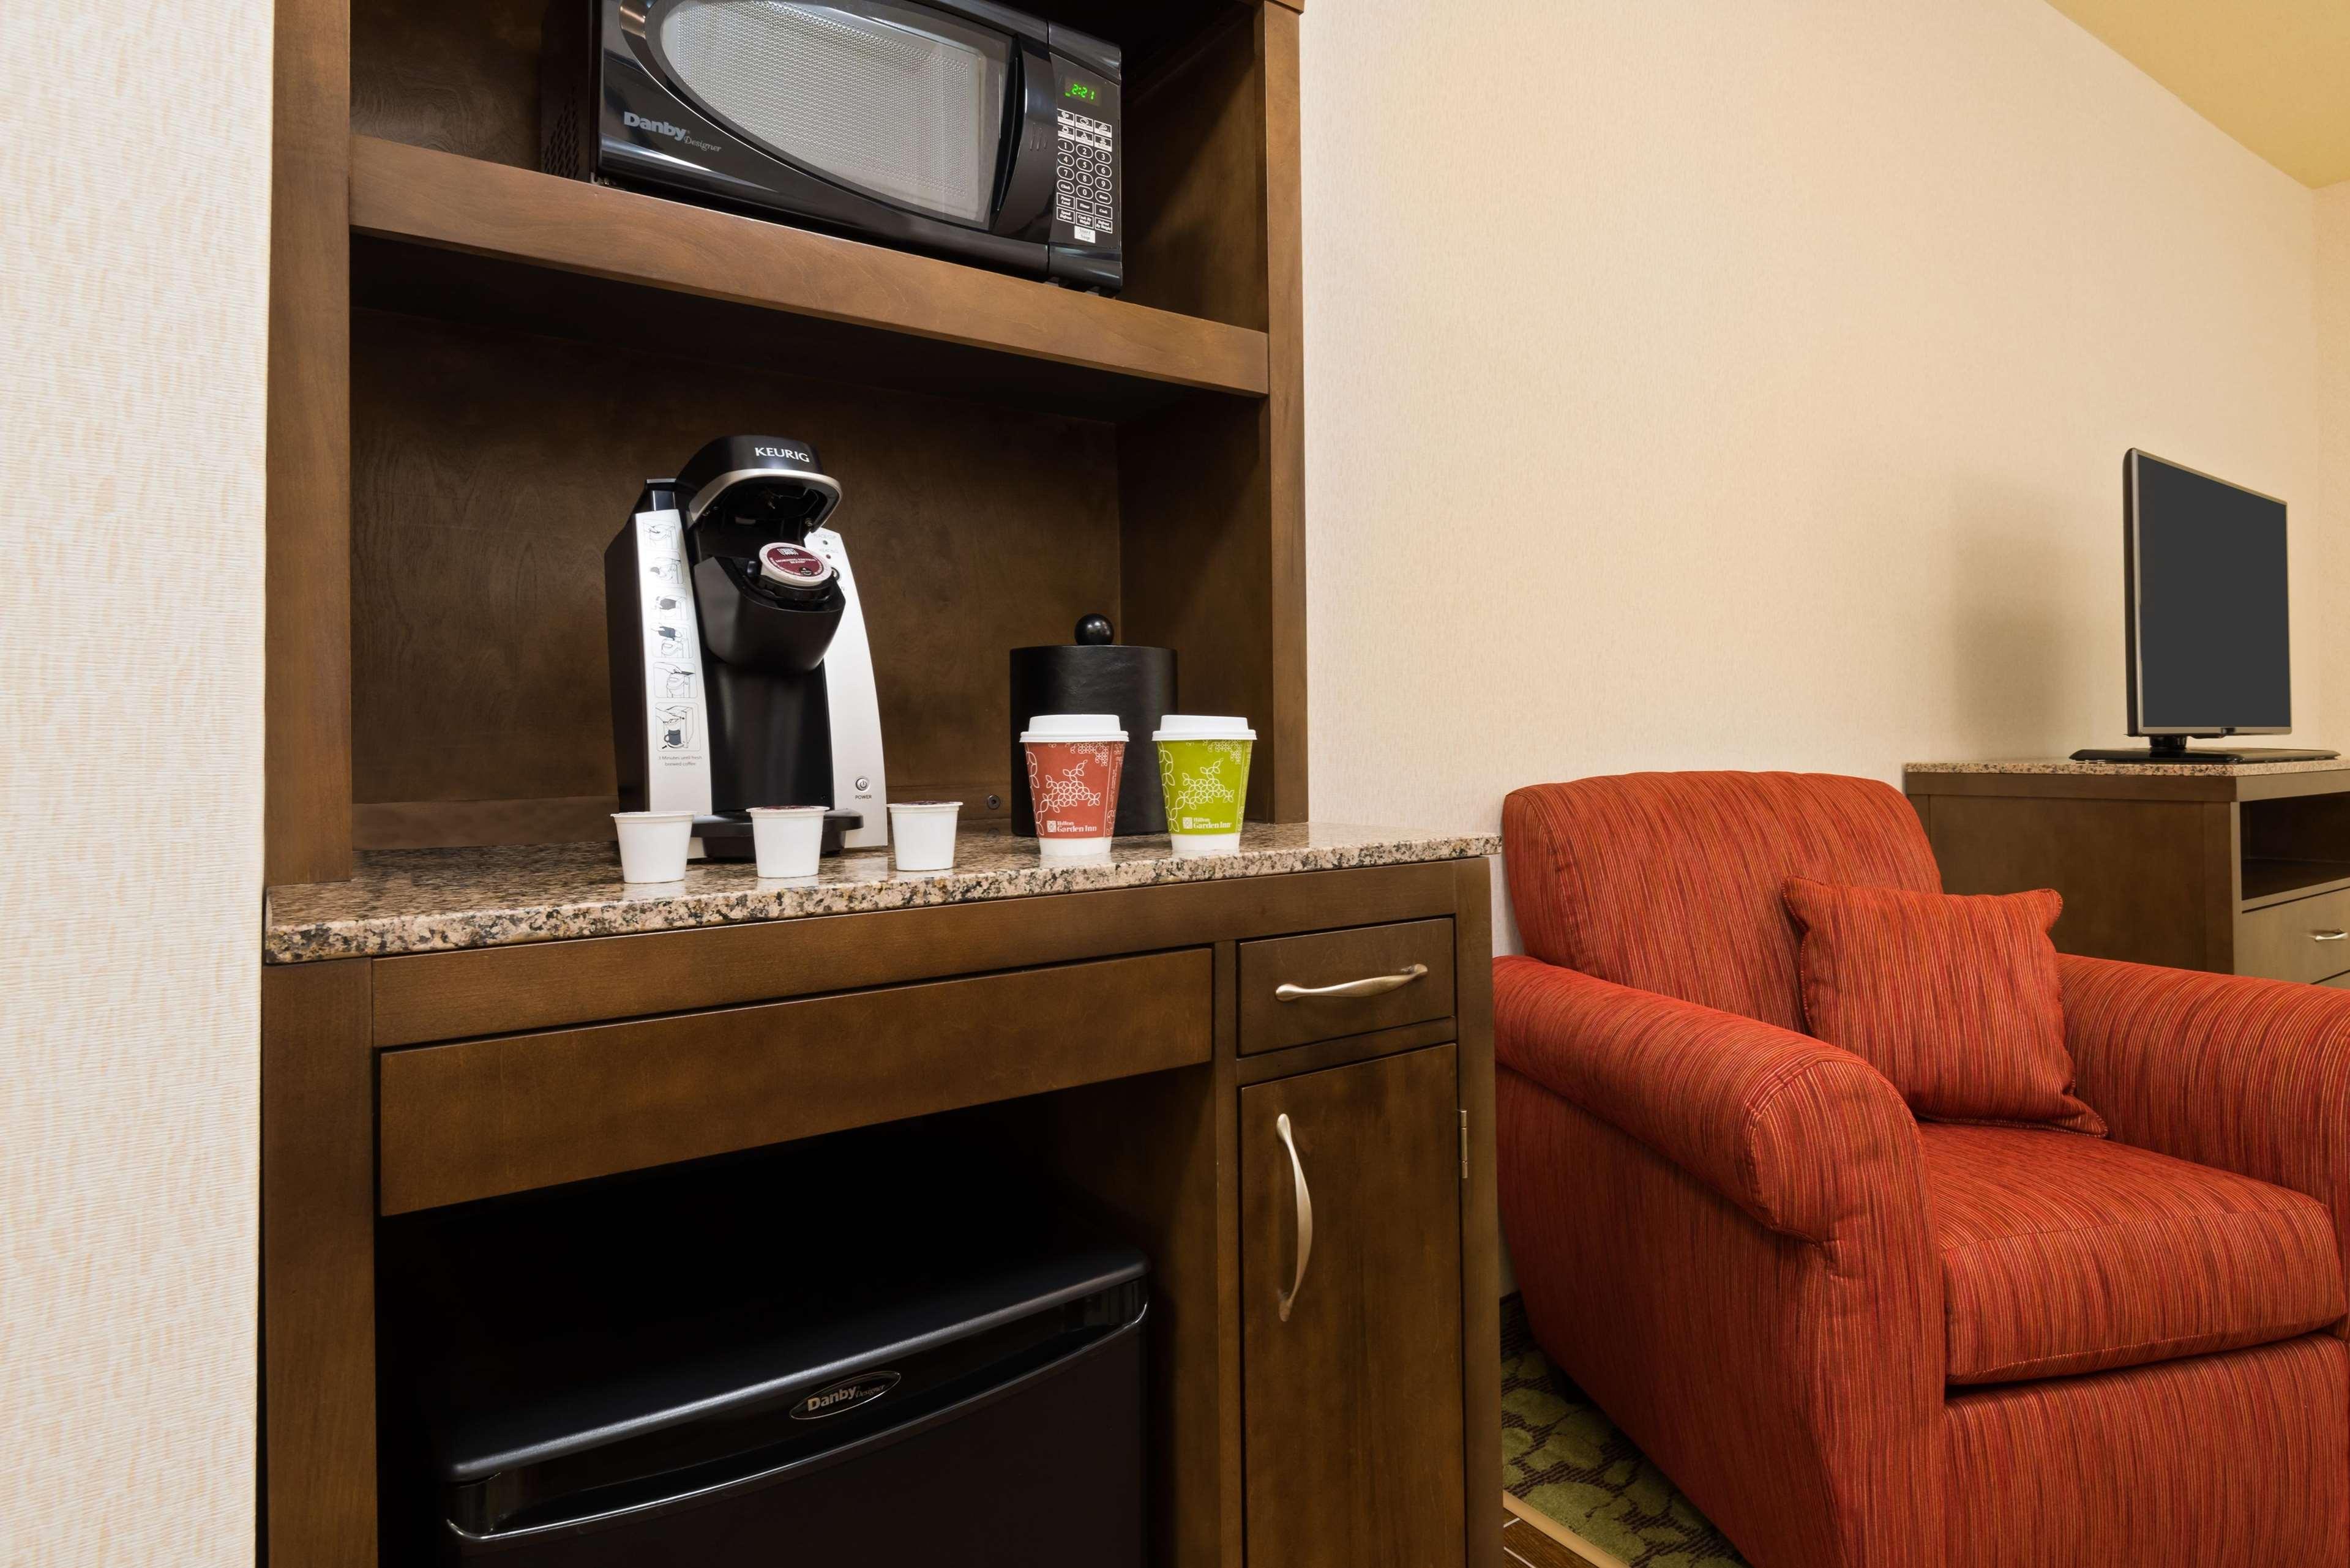 hilton garden inn wayne 15 nevins road wayne nj hotels motels mapquest - Hilton Garden Inn Wayne Nj